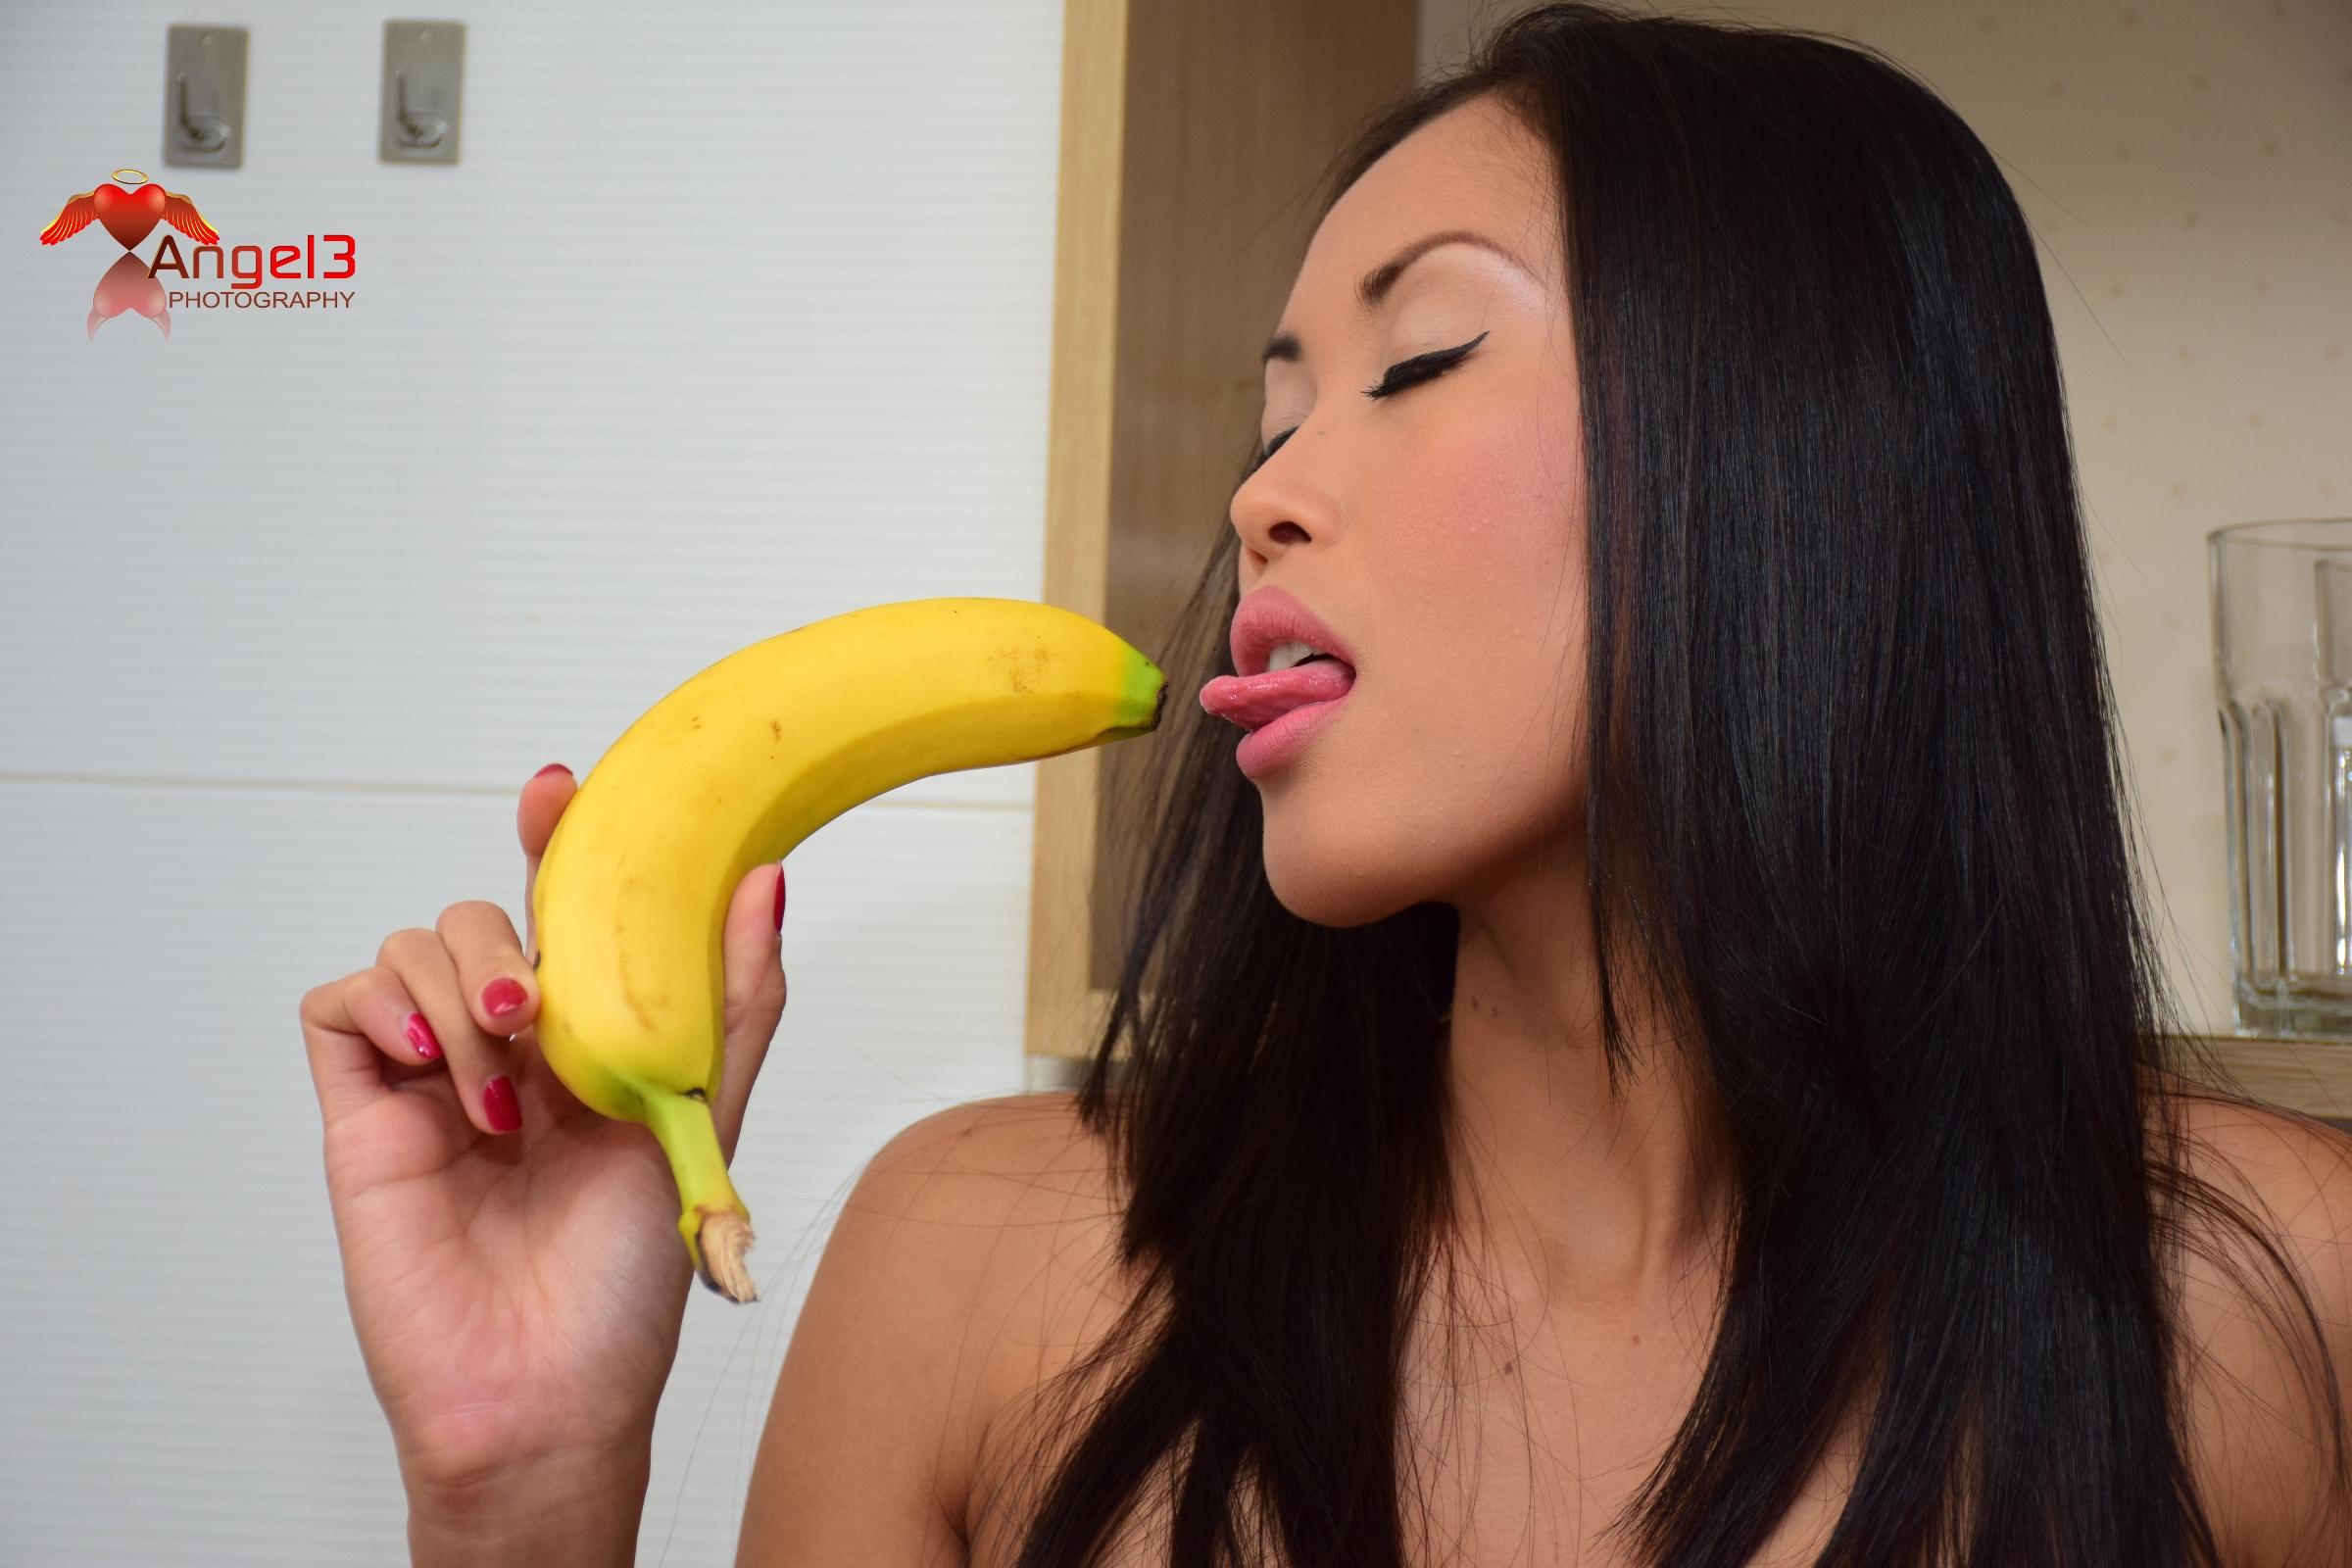 danika-flores-banana-009p